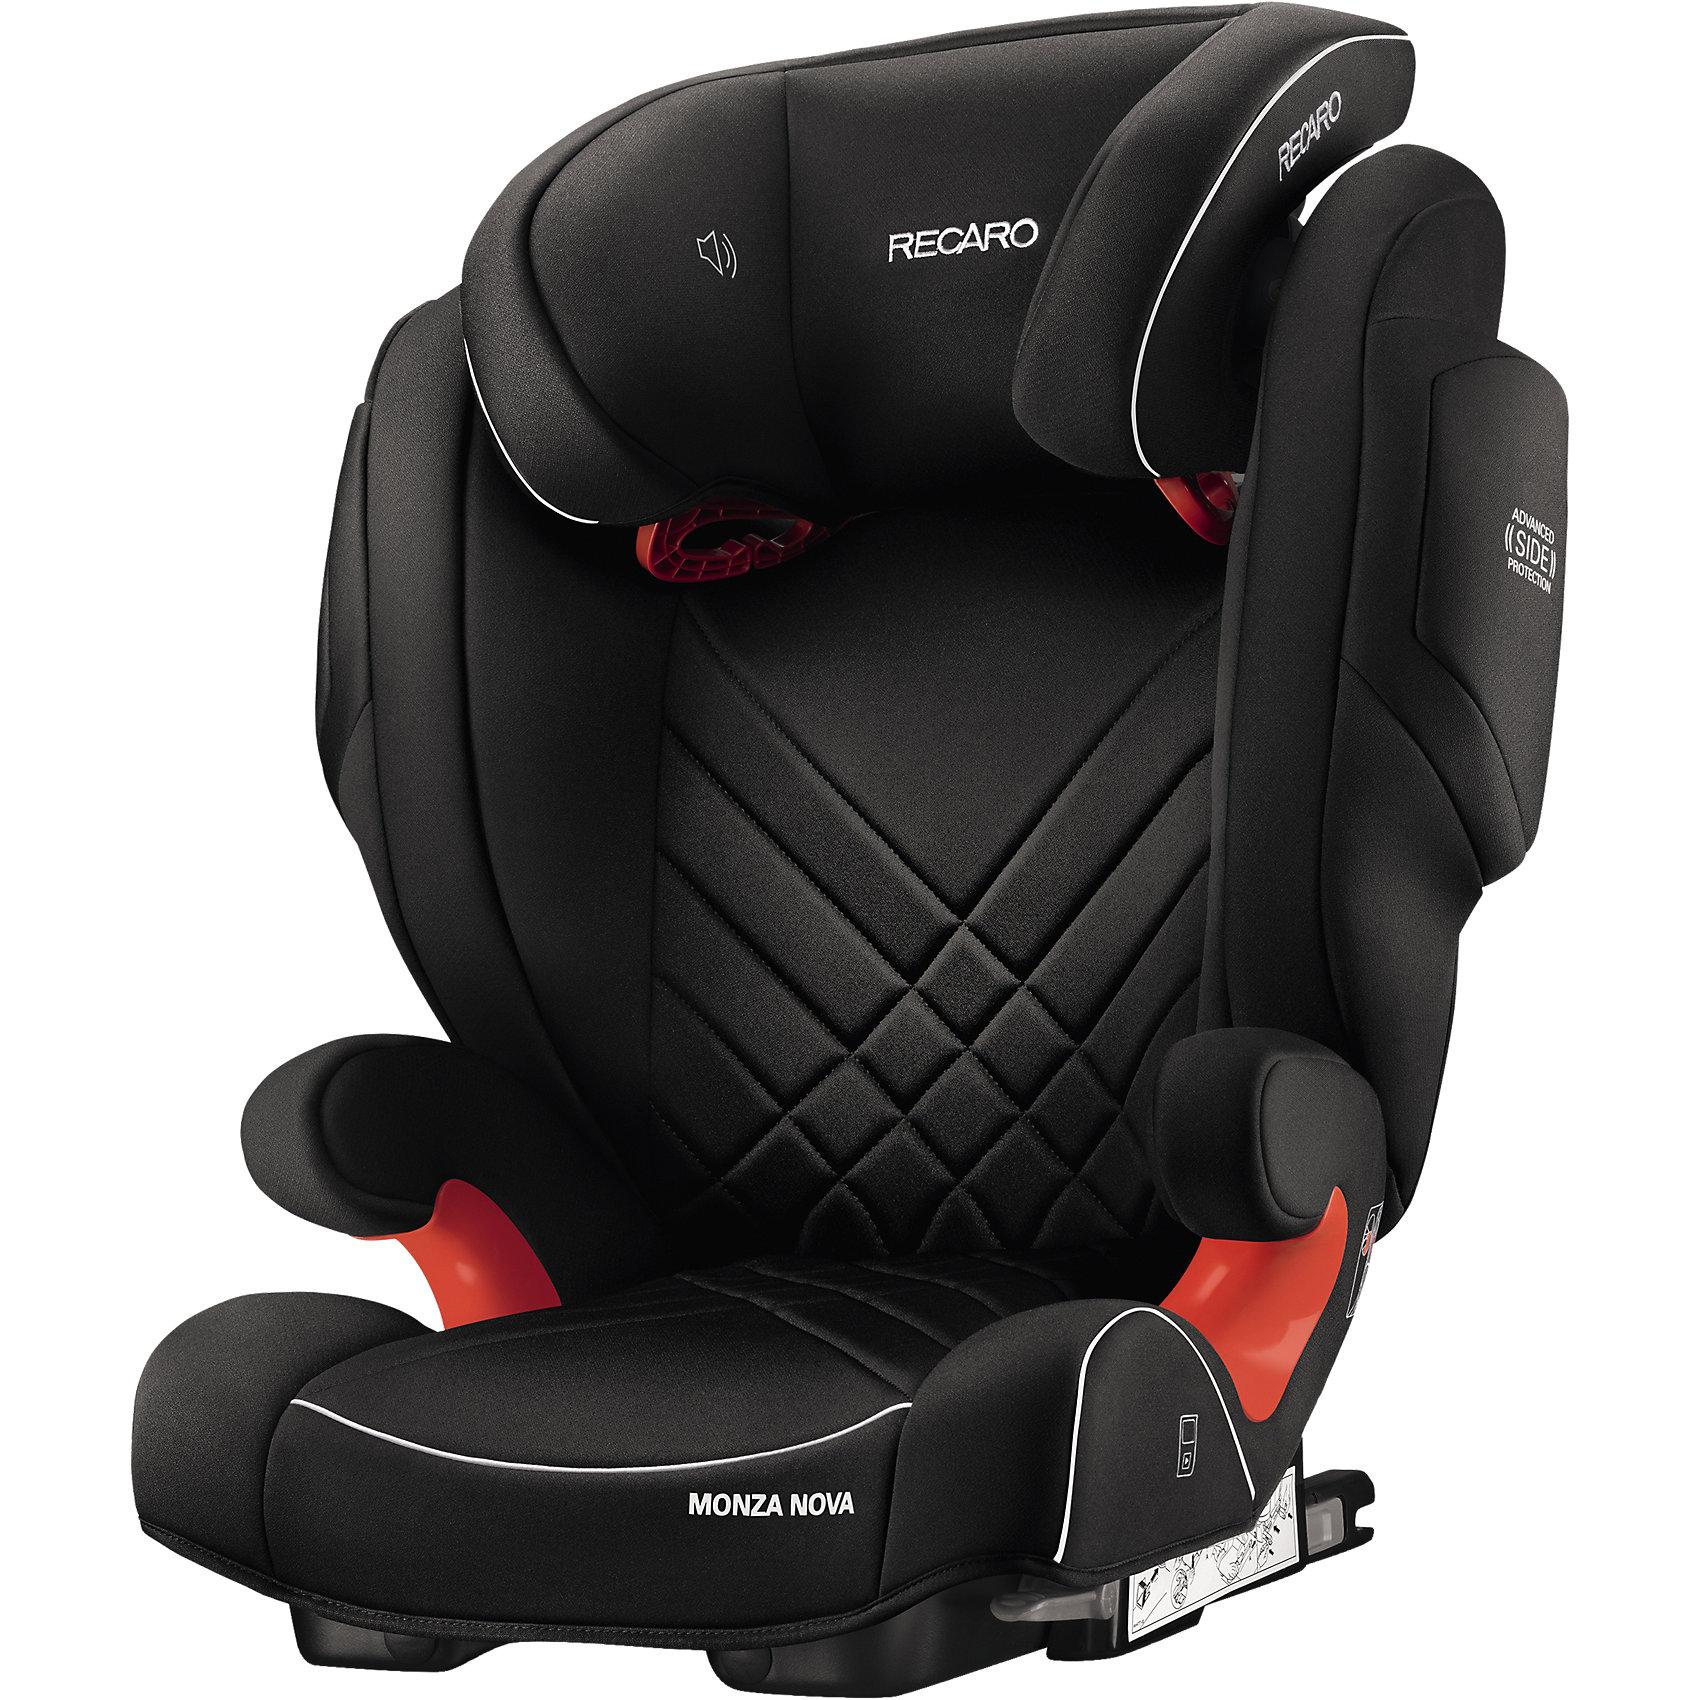 RECARO Автокресло Monza Nova 2 SF,  15-36 кг, Recaro, perfomance black автокресло recaro monza nova 2 seatfix 15 36 кг perfomance black